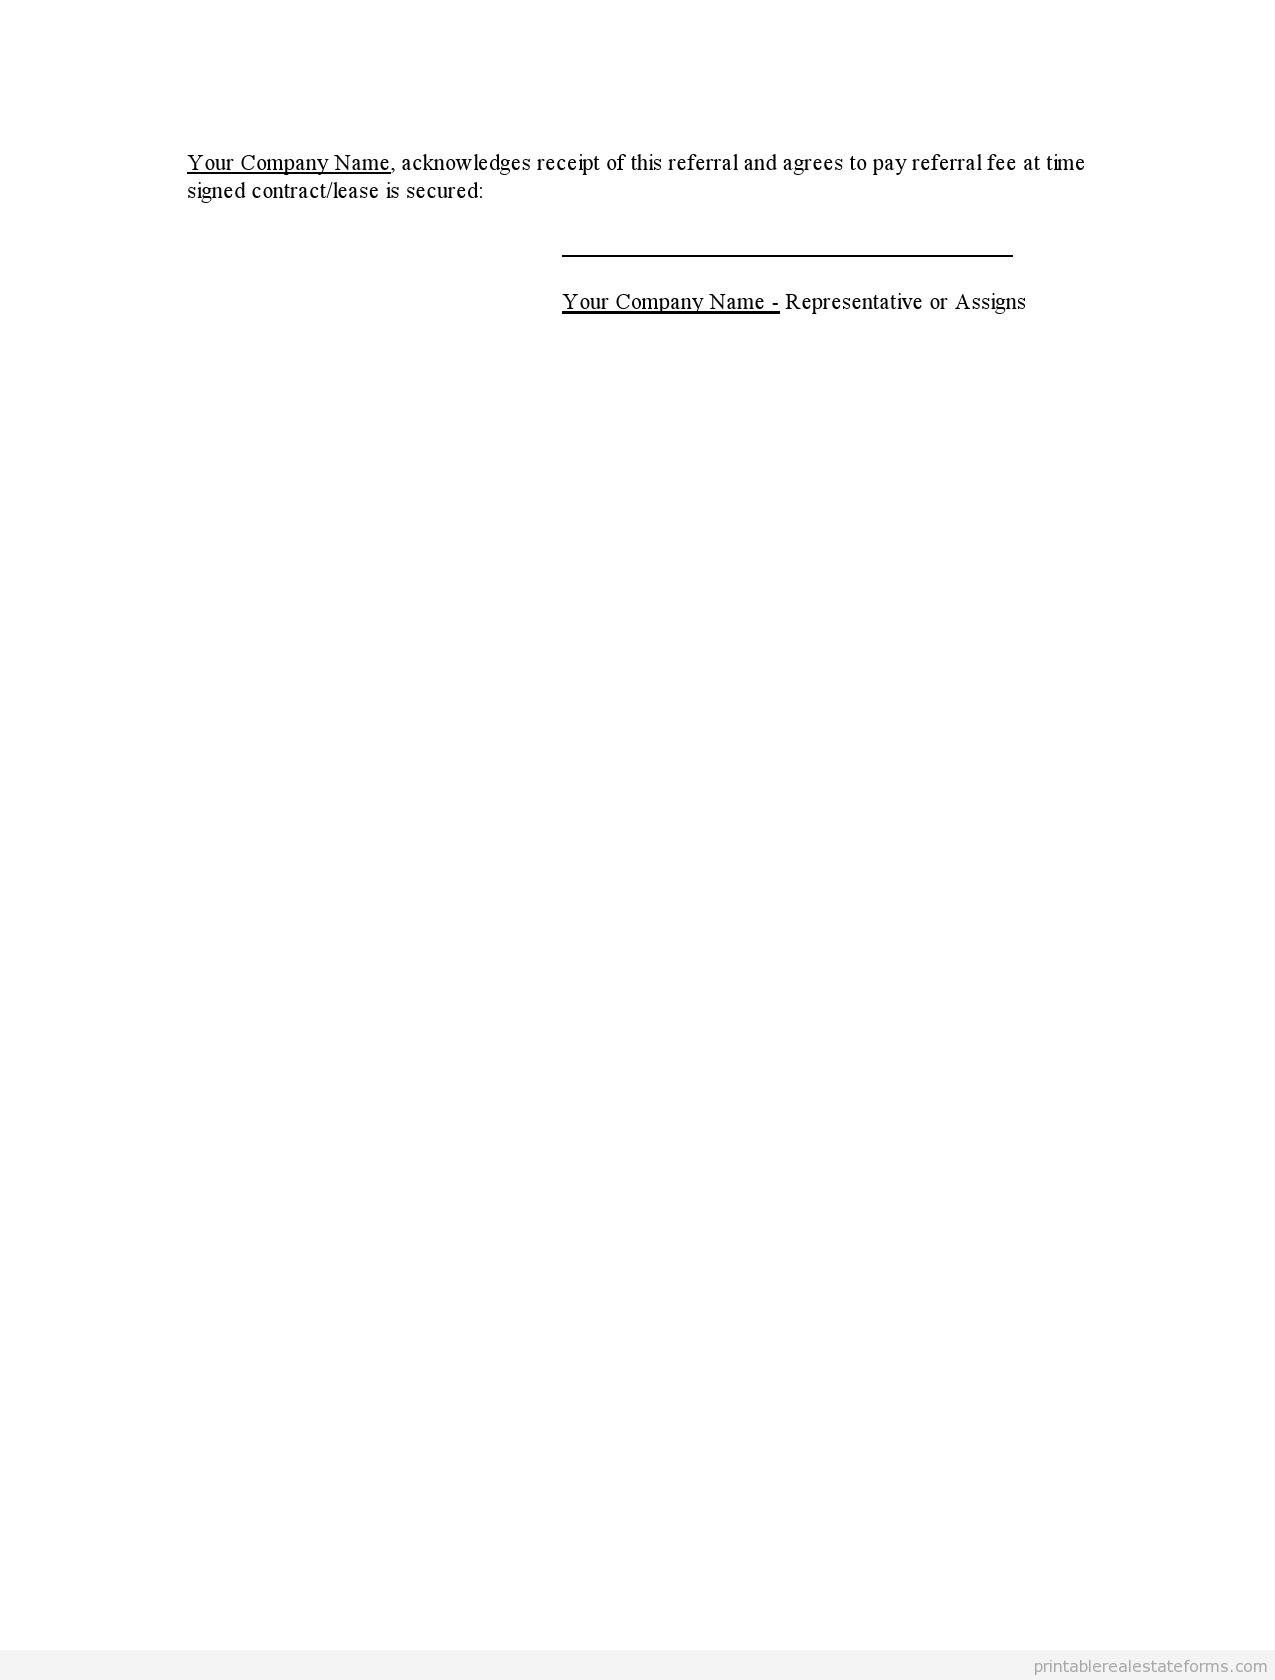 Printable Referral Sheet For Realtors Template